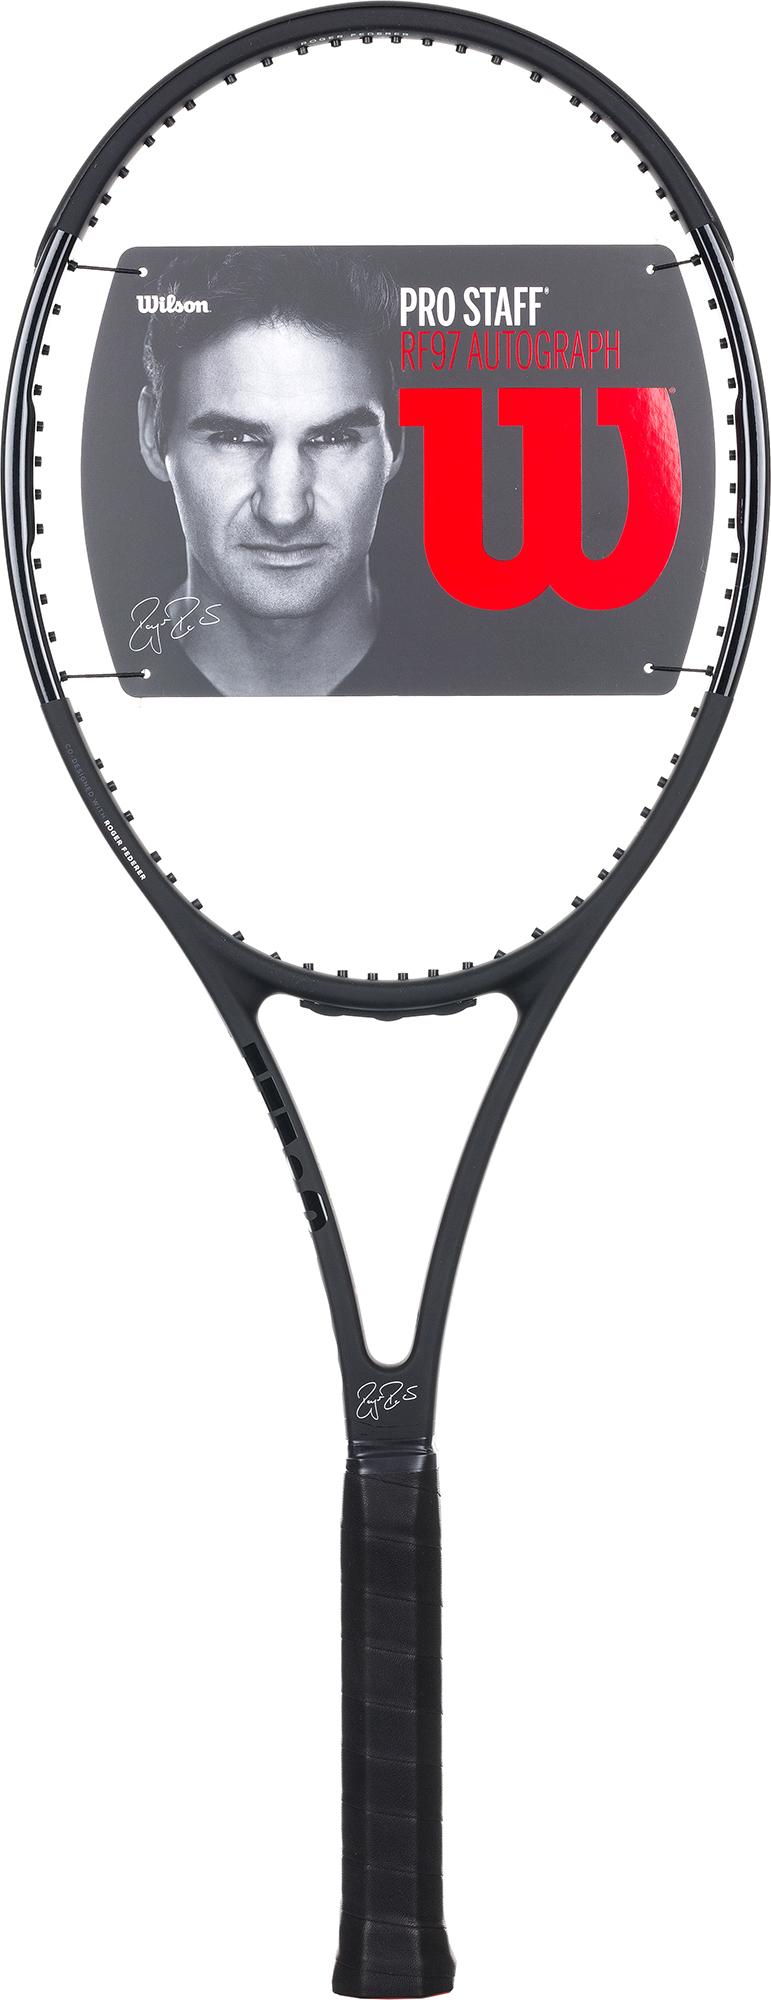 Wilson Ракетка для большого тенниса Wilson Pro Staff 97 Autograph, размер 3 wilson ракетка для большого тенниса детская wilson roger federer 23 размер без размера